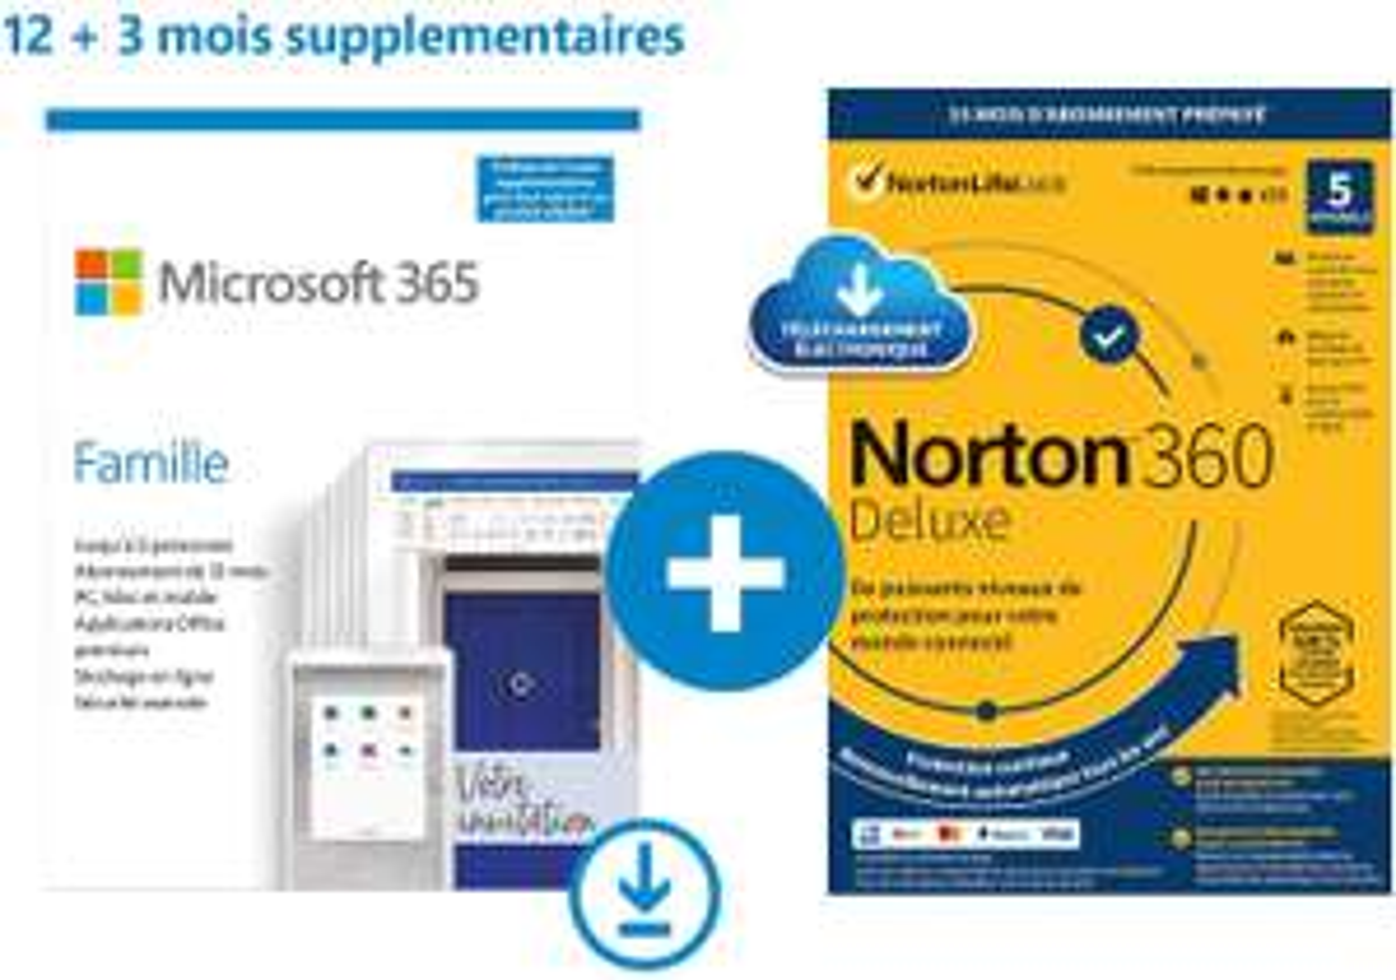 Microsoft 365 Famille + Notion 360 Deluxe ou MacAffee 2021 Total Protection 12 Mois + 3 Mois offerts (Dématérialisé)